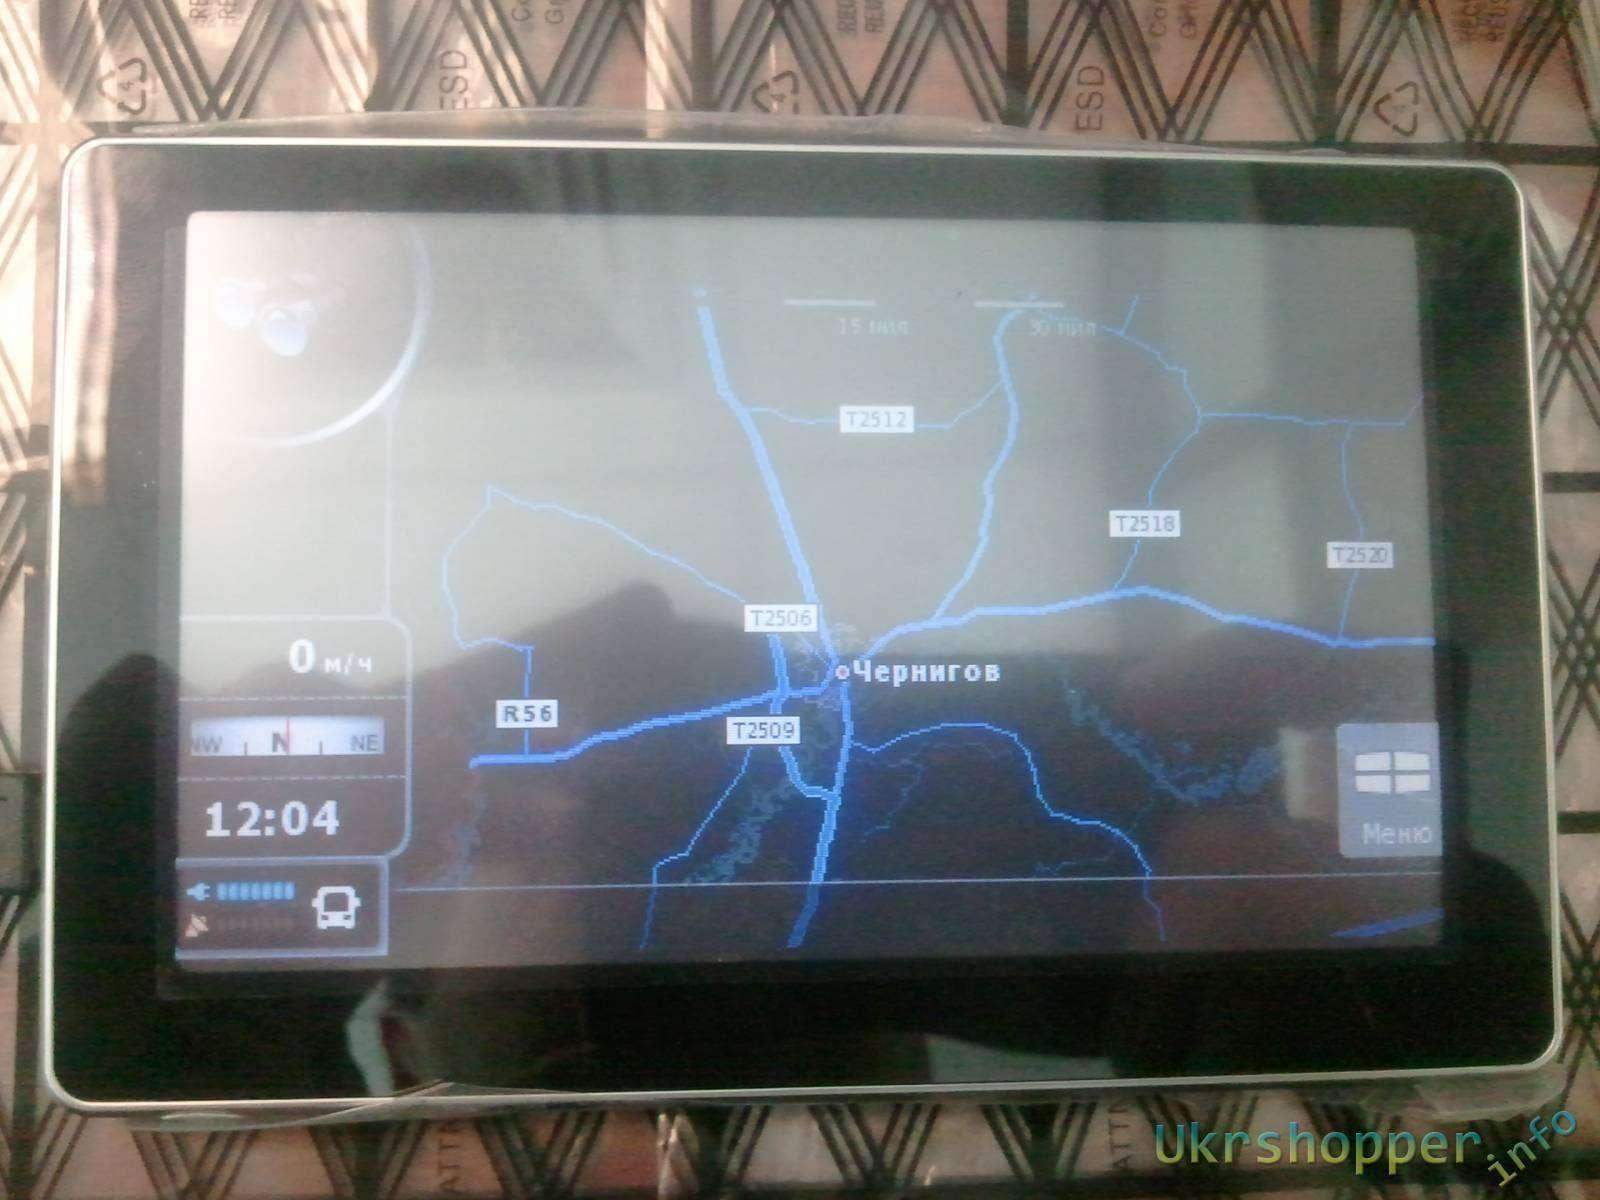 Aliexpress: Обзор автомобильного 5' GPS - навигатора с MP3 MP4 FM Transmitter